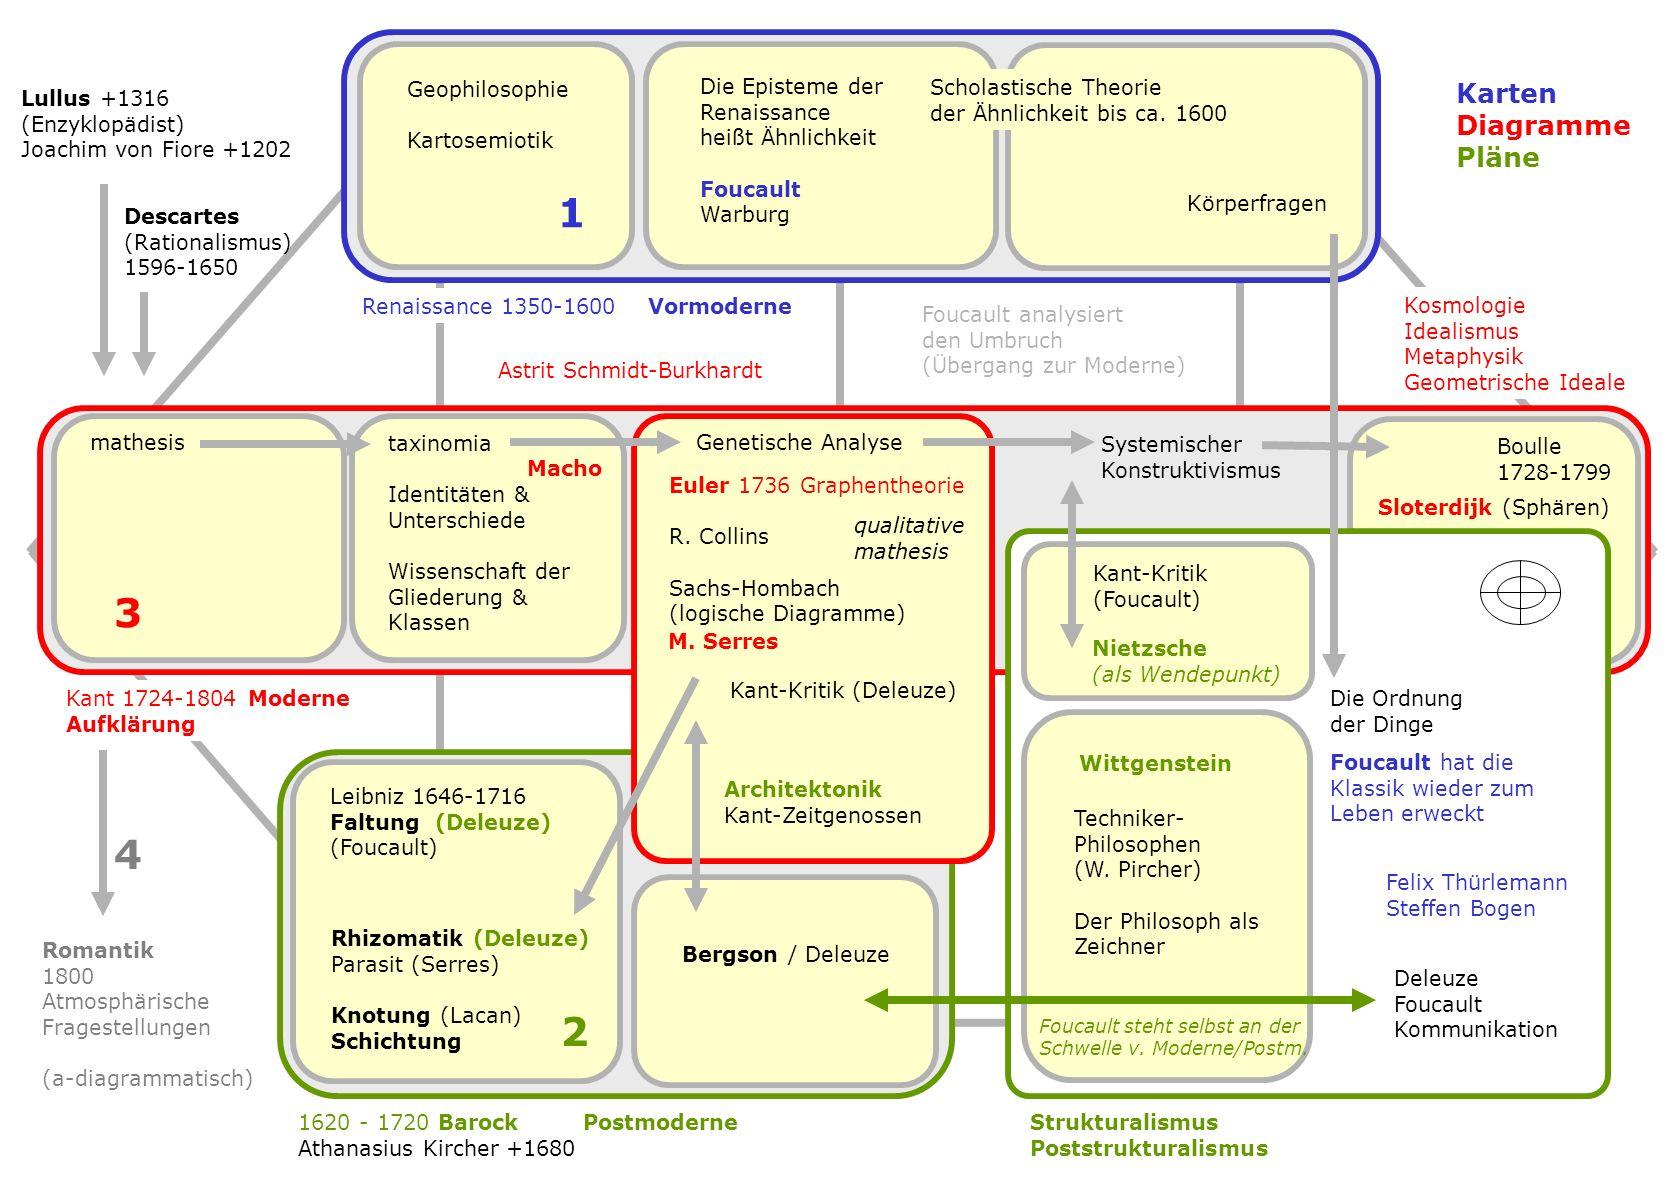 1 3 4 2 B S F Z Karten Diagramme Pläne Geophilosophie Kartosemiotik